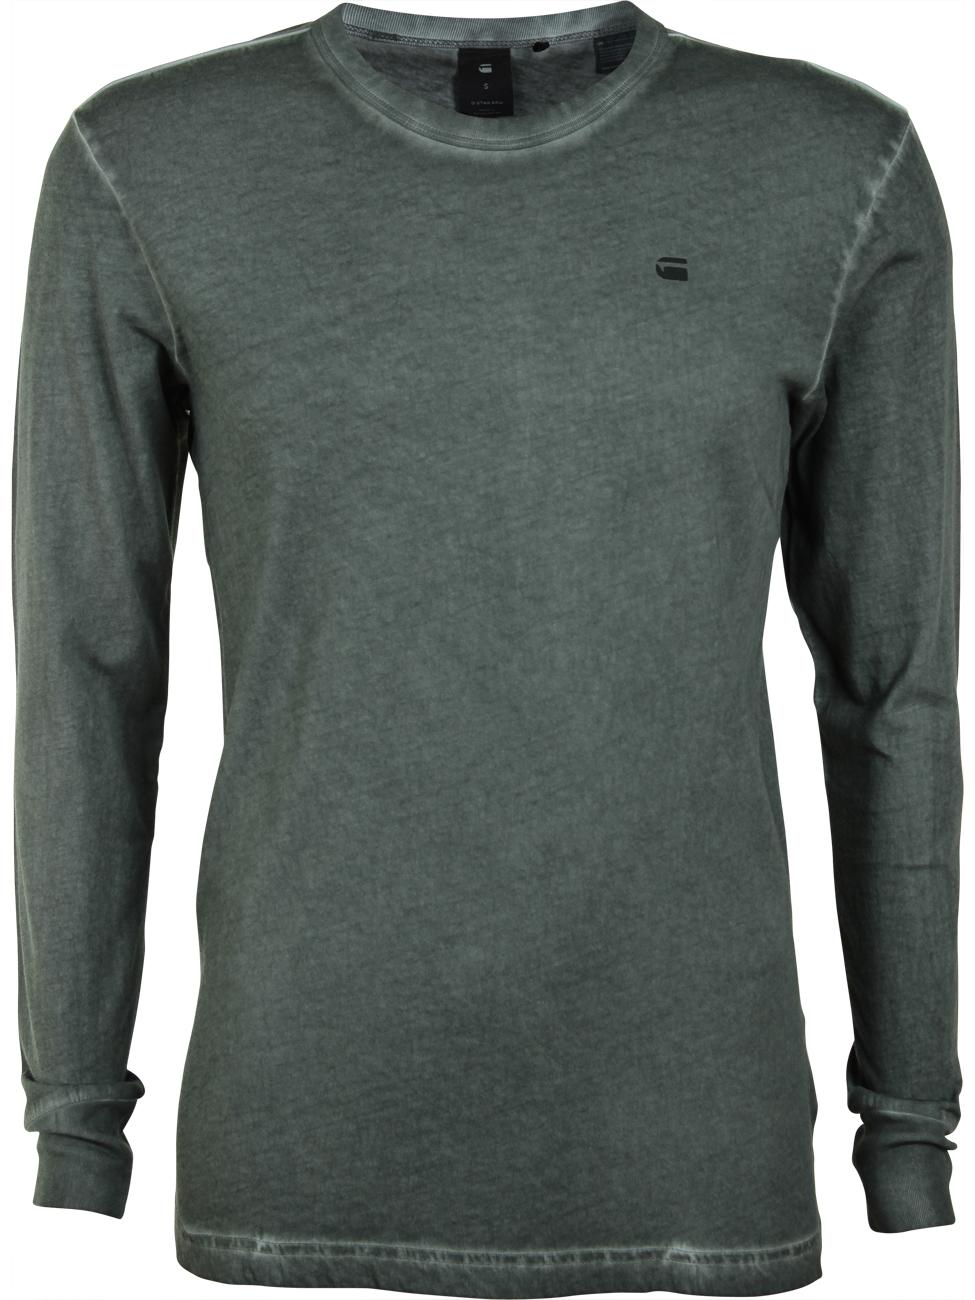 G-Star Herren Langarm-Shirt Youn jersey